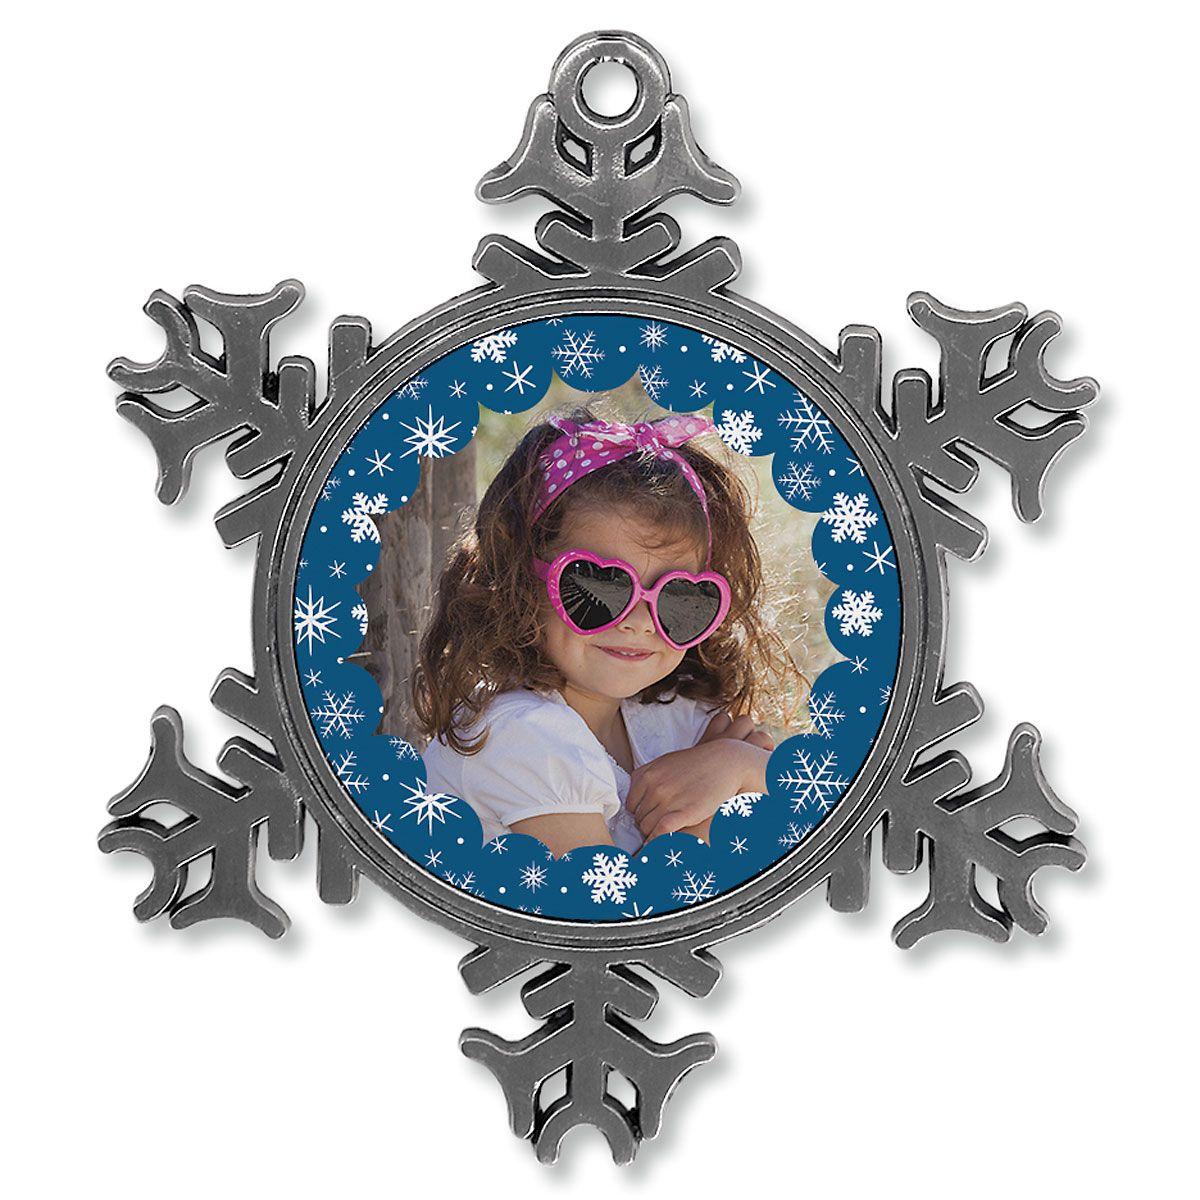 Snowflake Photo Ornament - Metal Snowflake